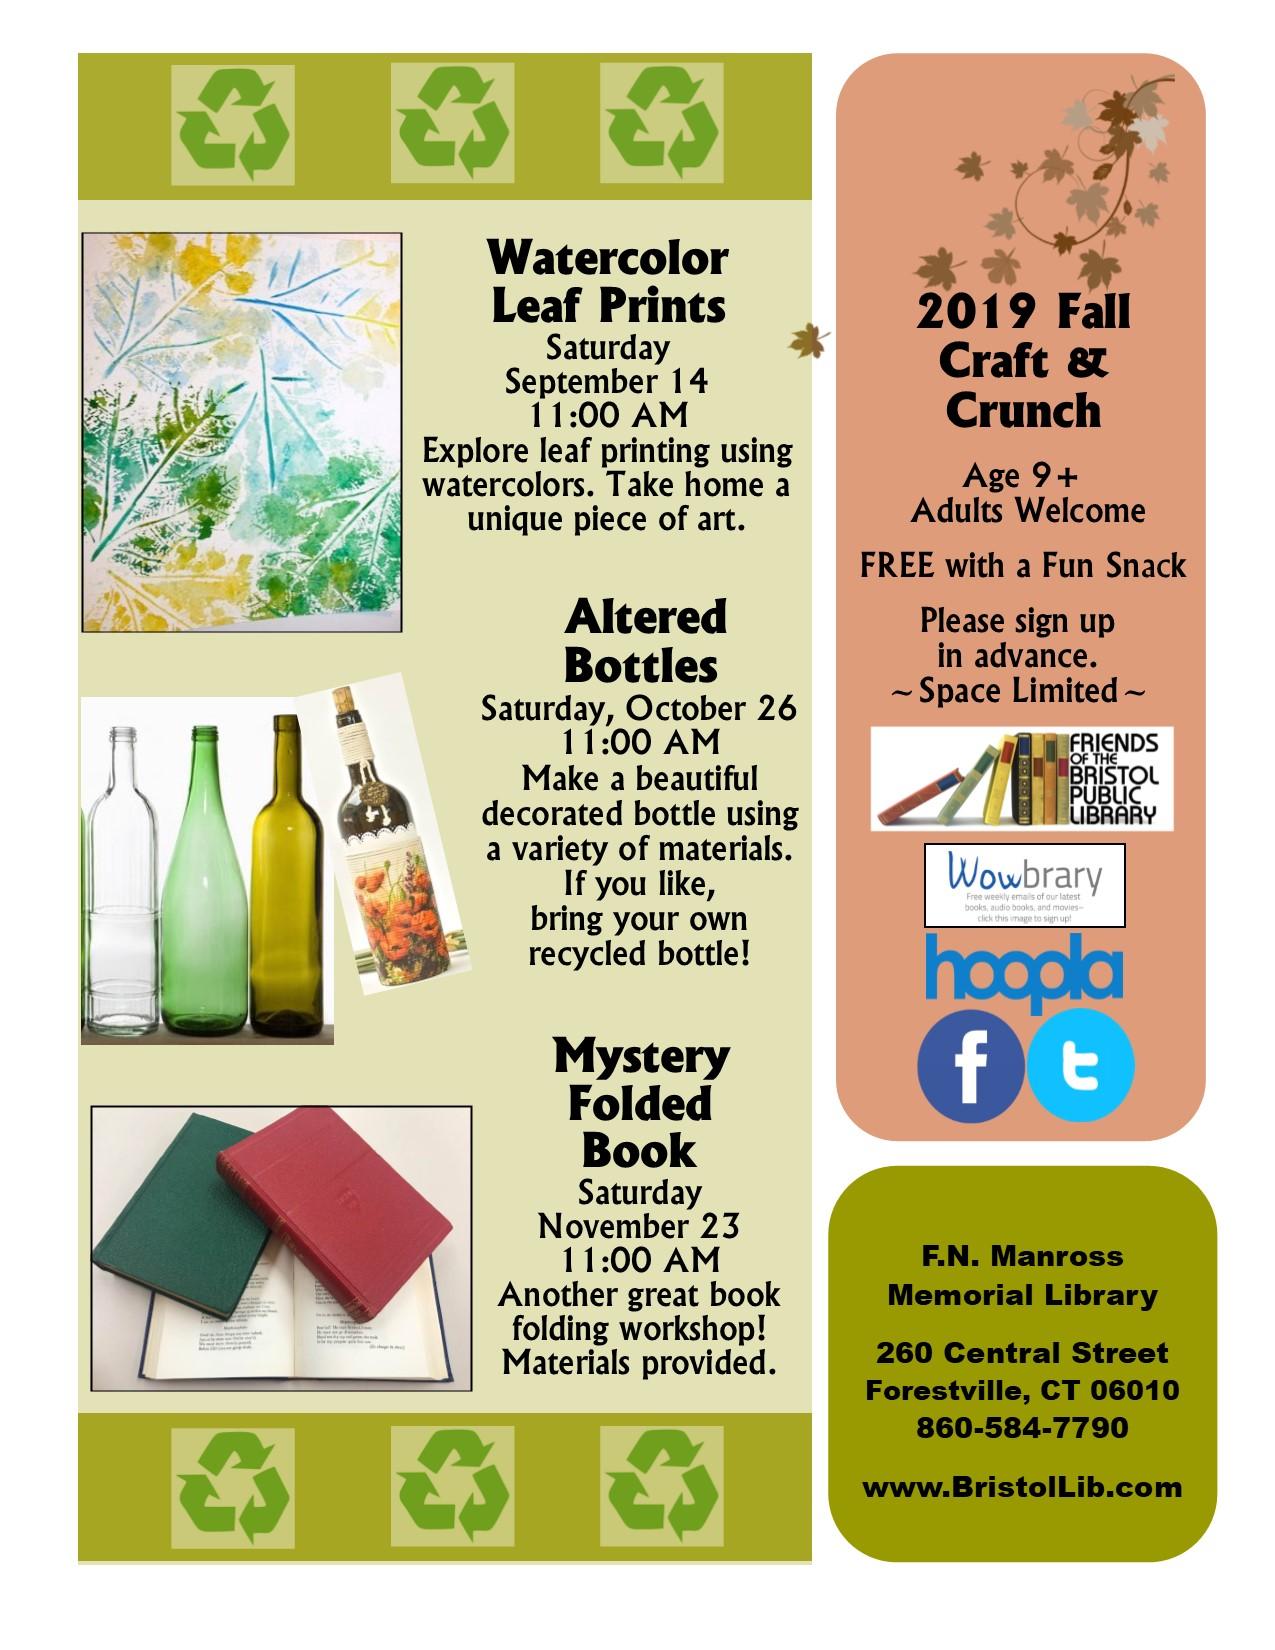 Watercolor Leaf Prints - Bristol Public Library